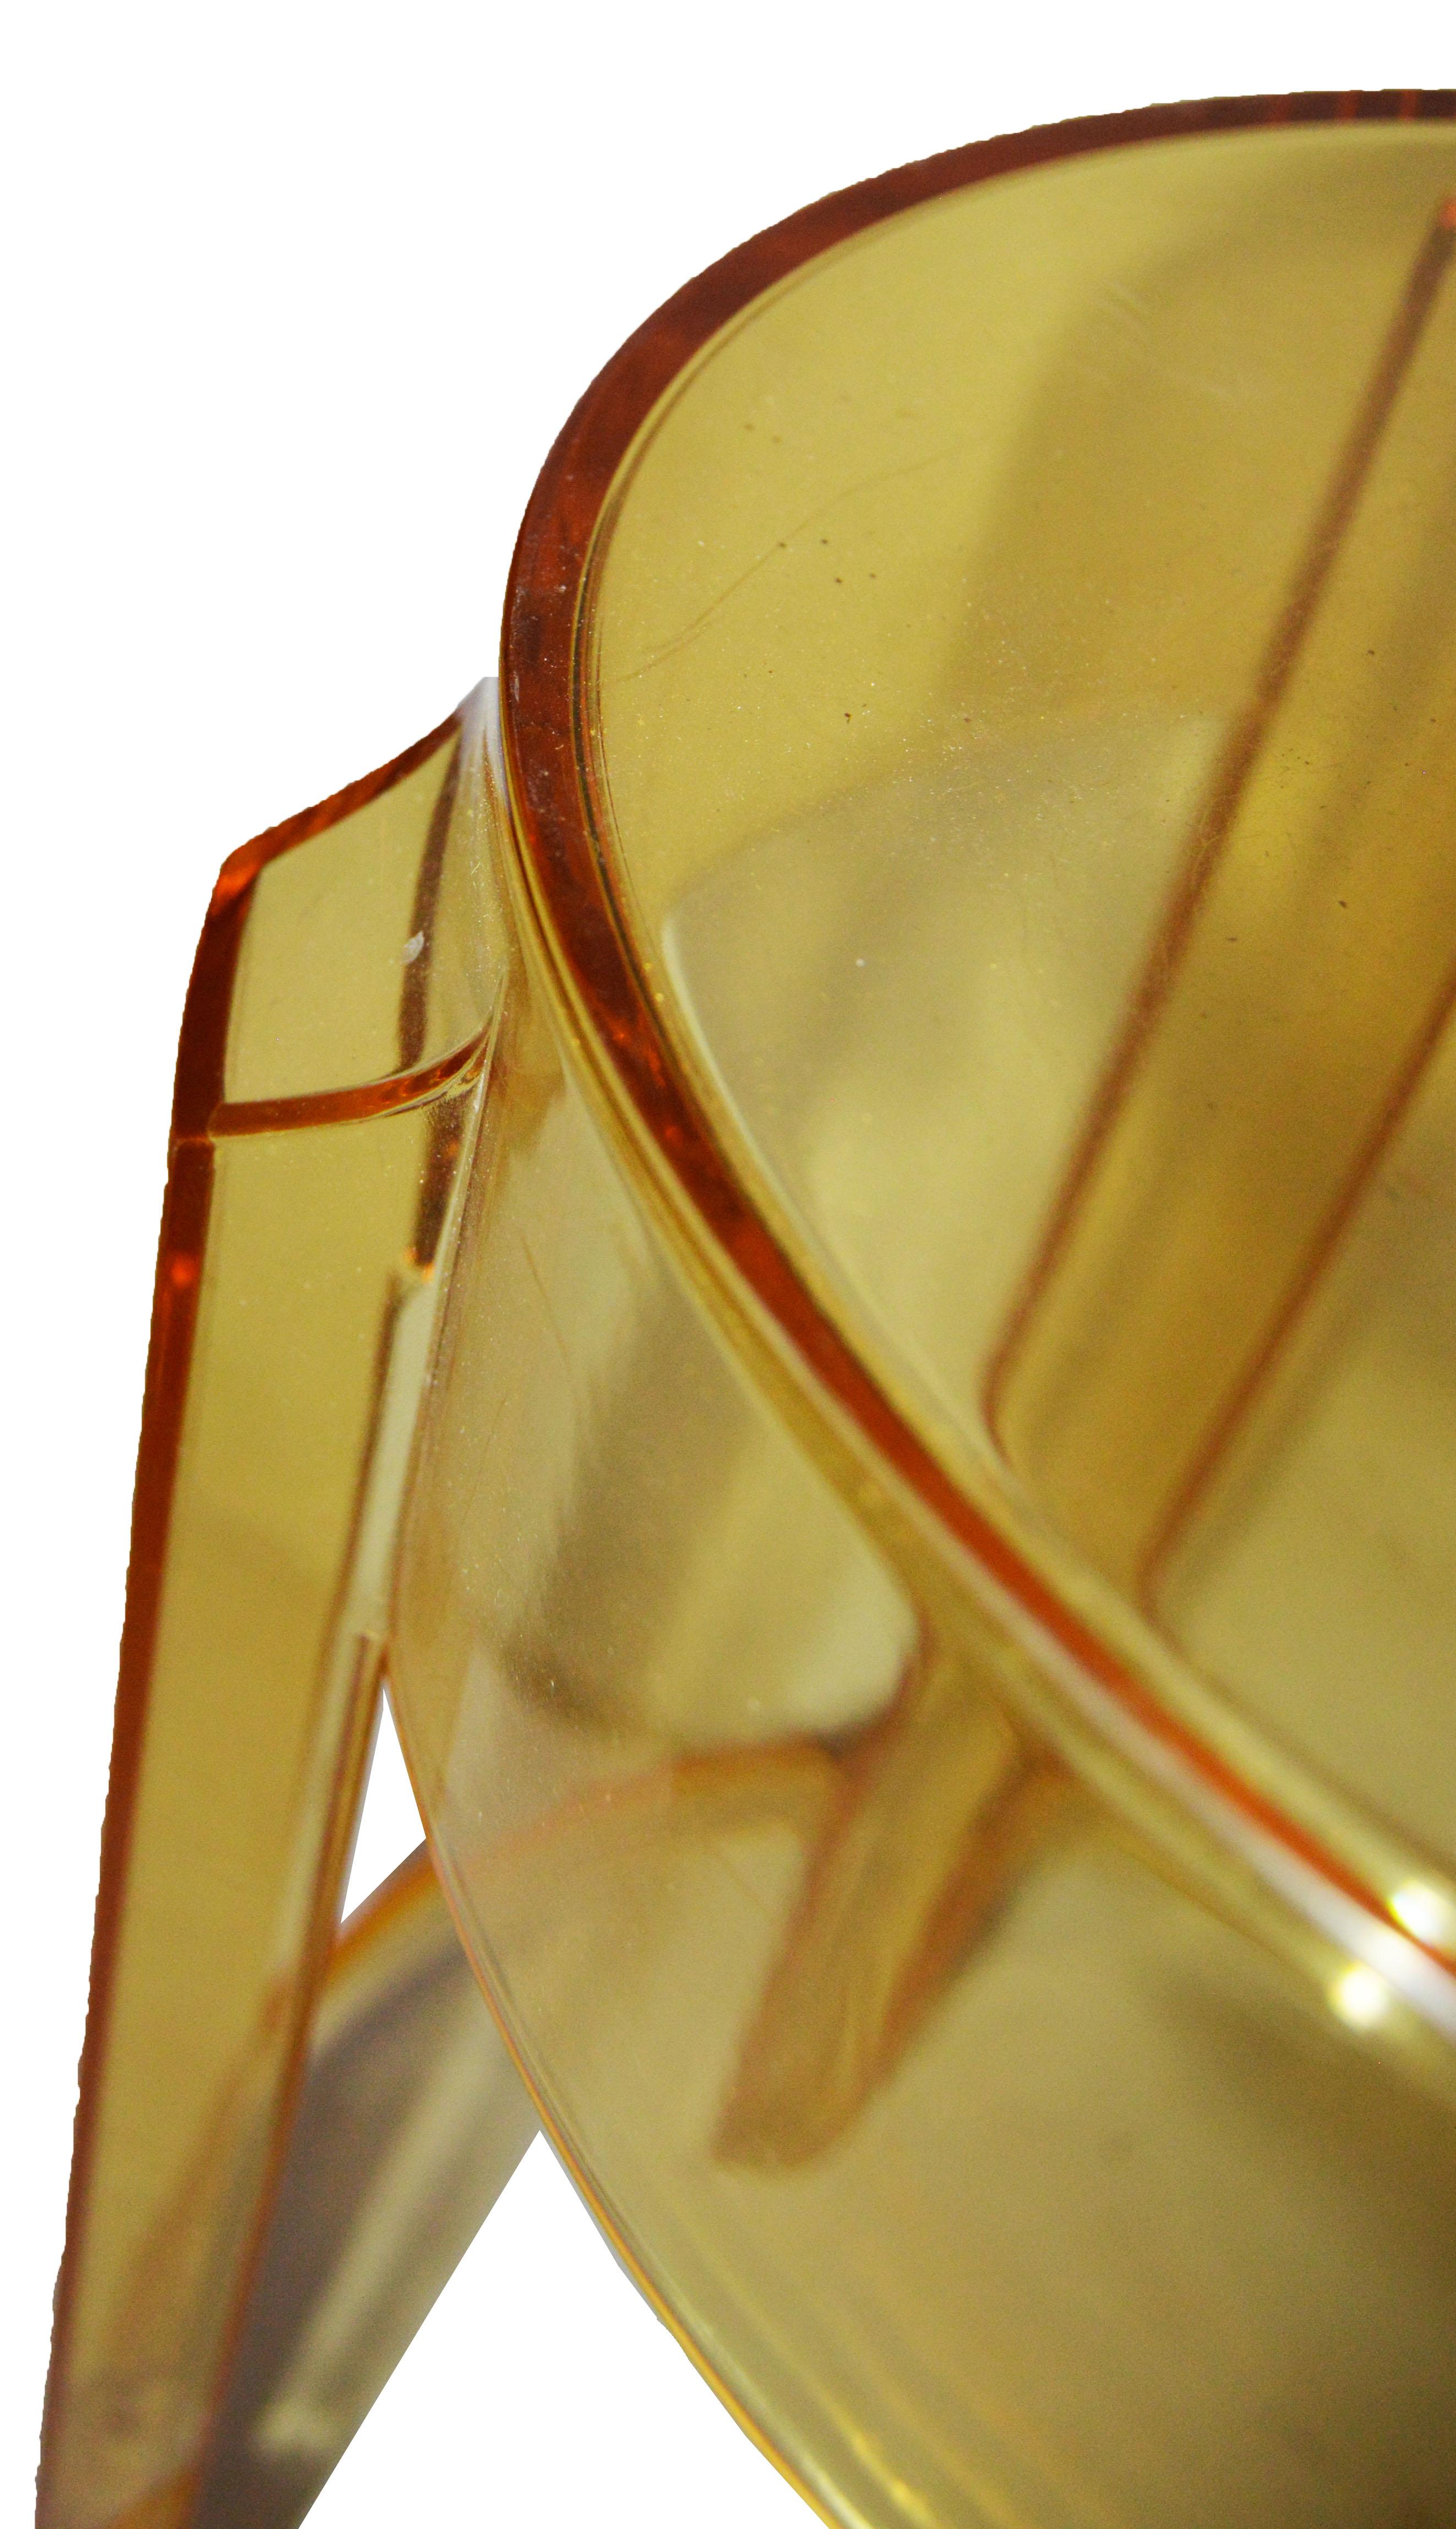 Vintage P Starck Model Quot Ghost Quot Stools Set Of 4 Chairish